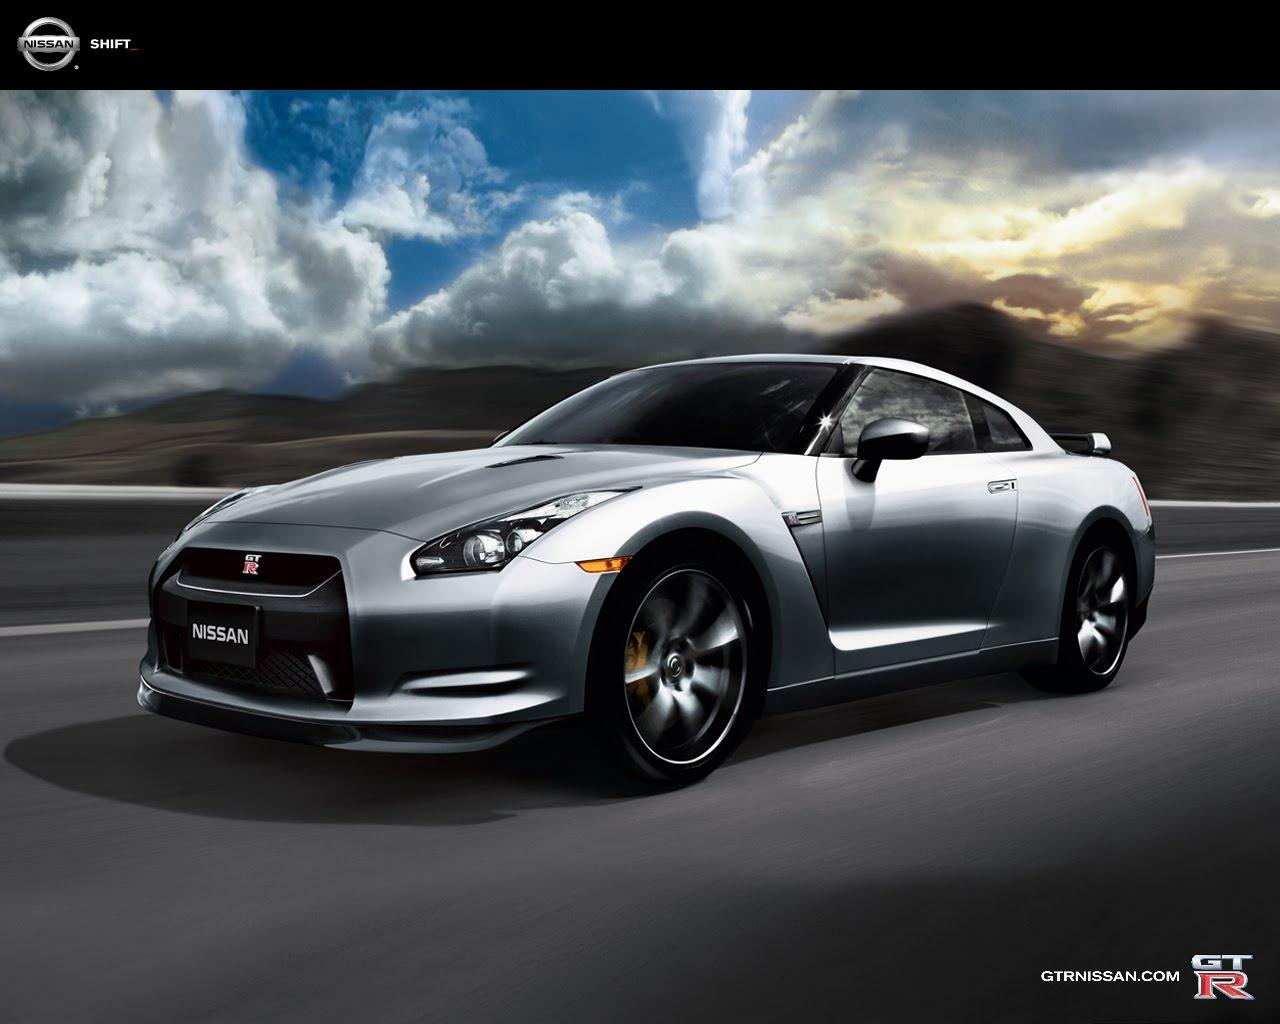 Exotic Car Wallpaper Download HD Wallpapers 1280x1024